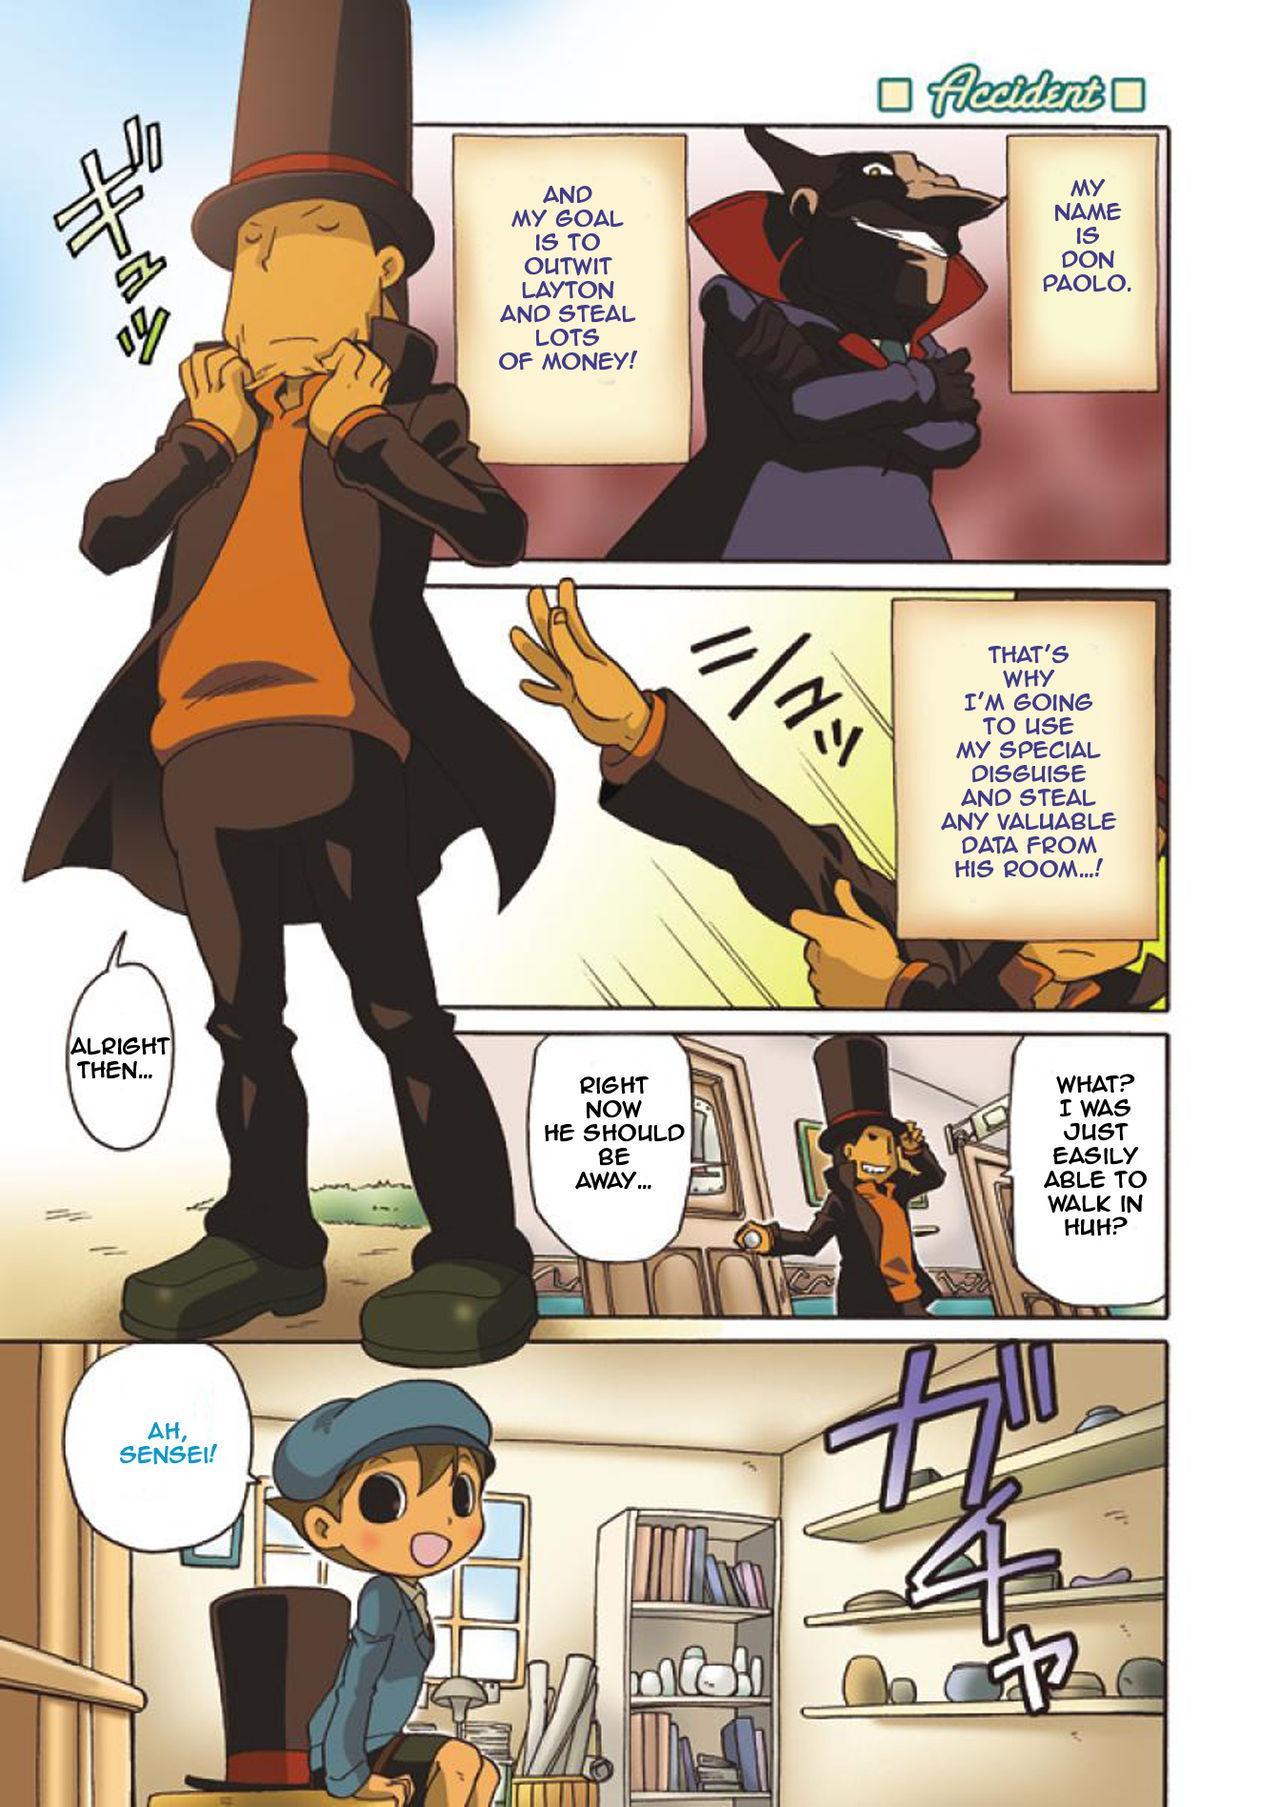 (C74) [M Kichibeya (Uchida Junta)] Luke to Meisou suru Otona (Professor Layton) full version [English] 53